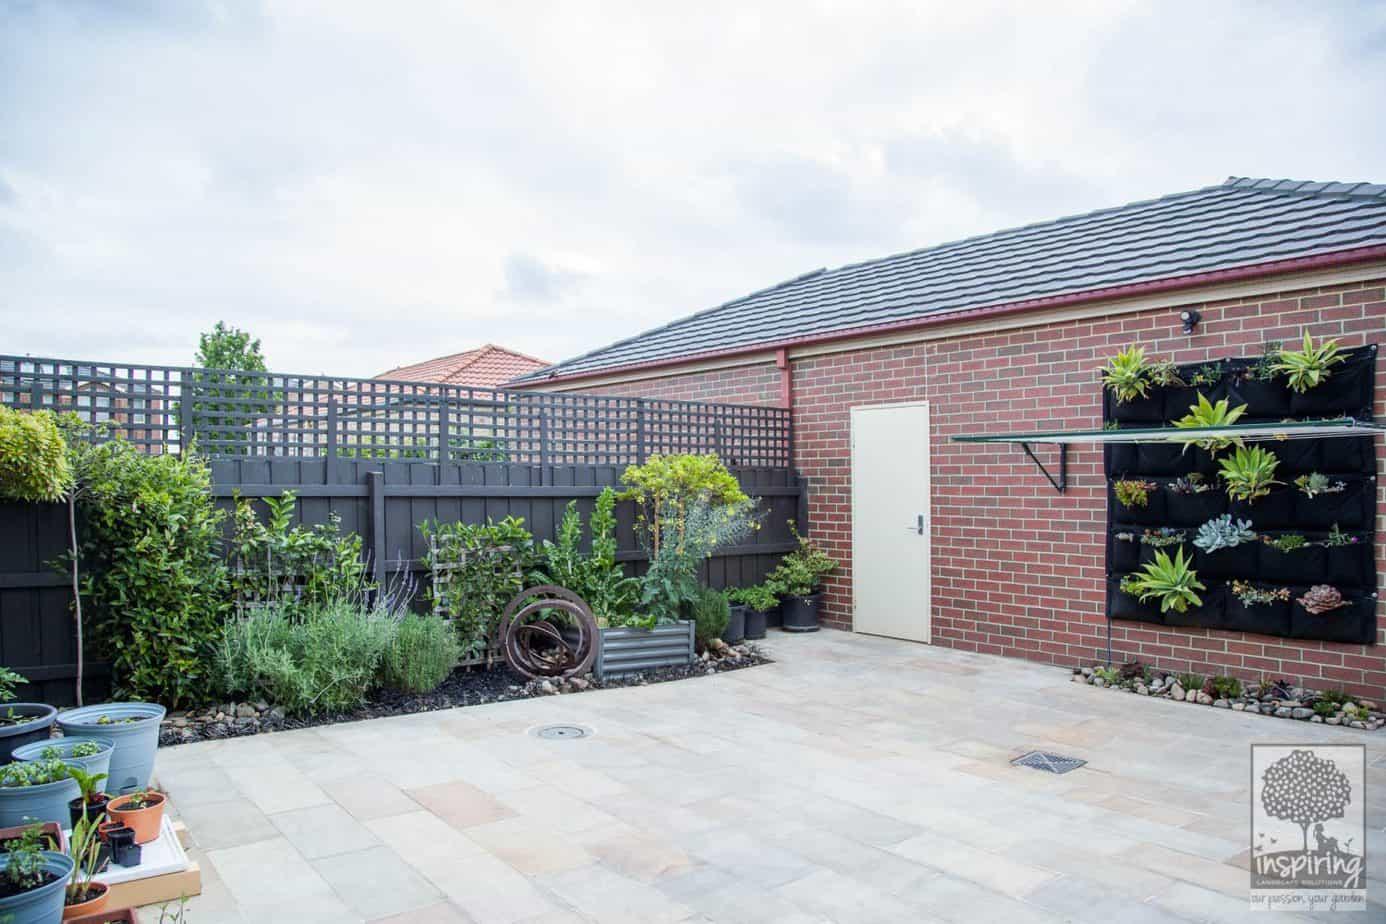 Bundoora garden design with sandstone paving and edible planting by Parveen Dhaliwal